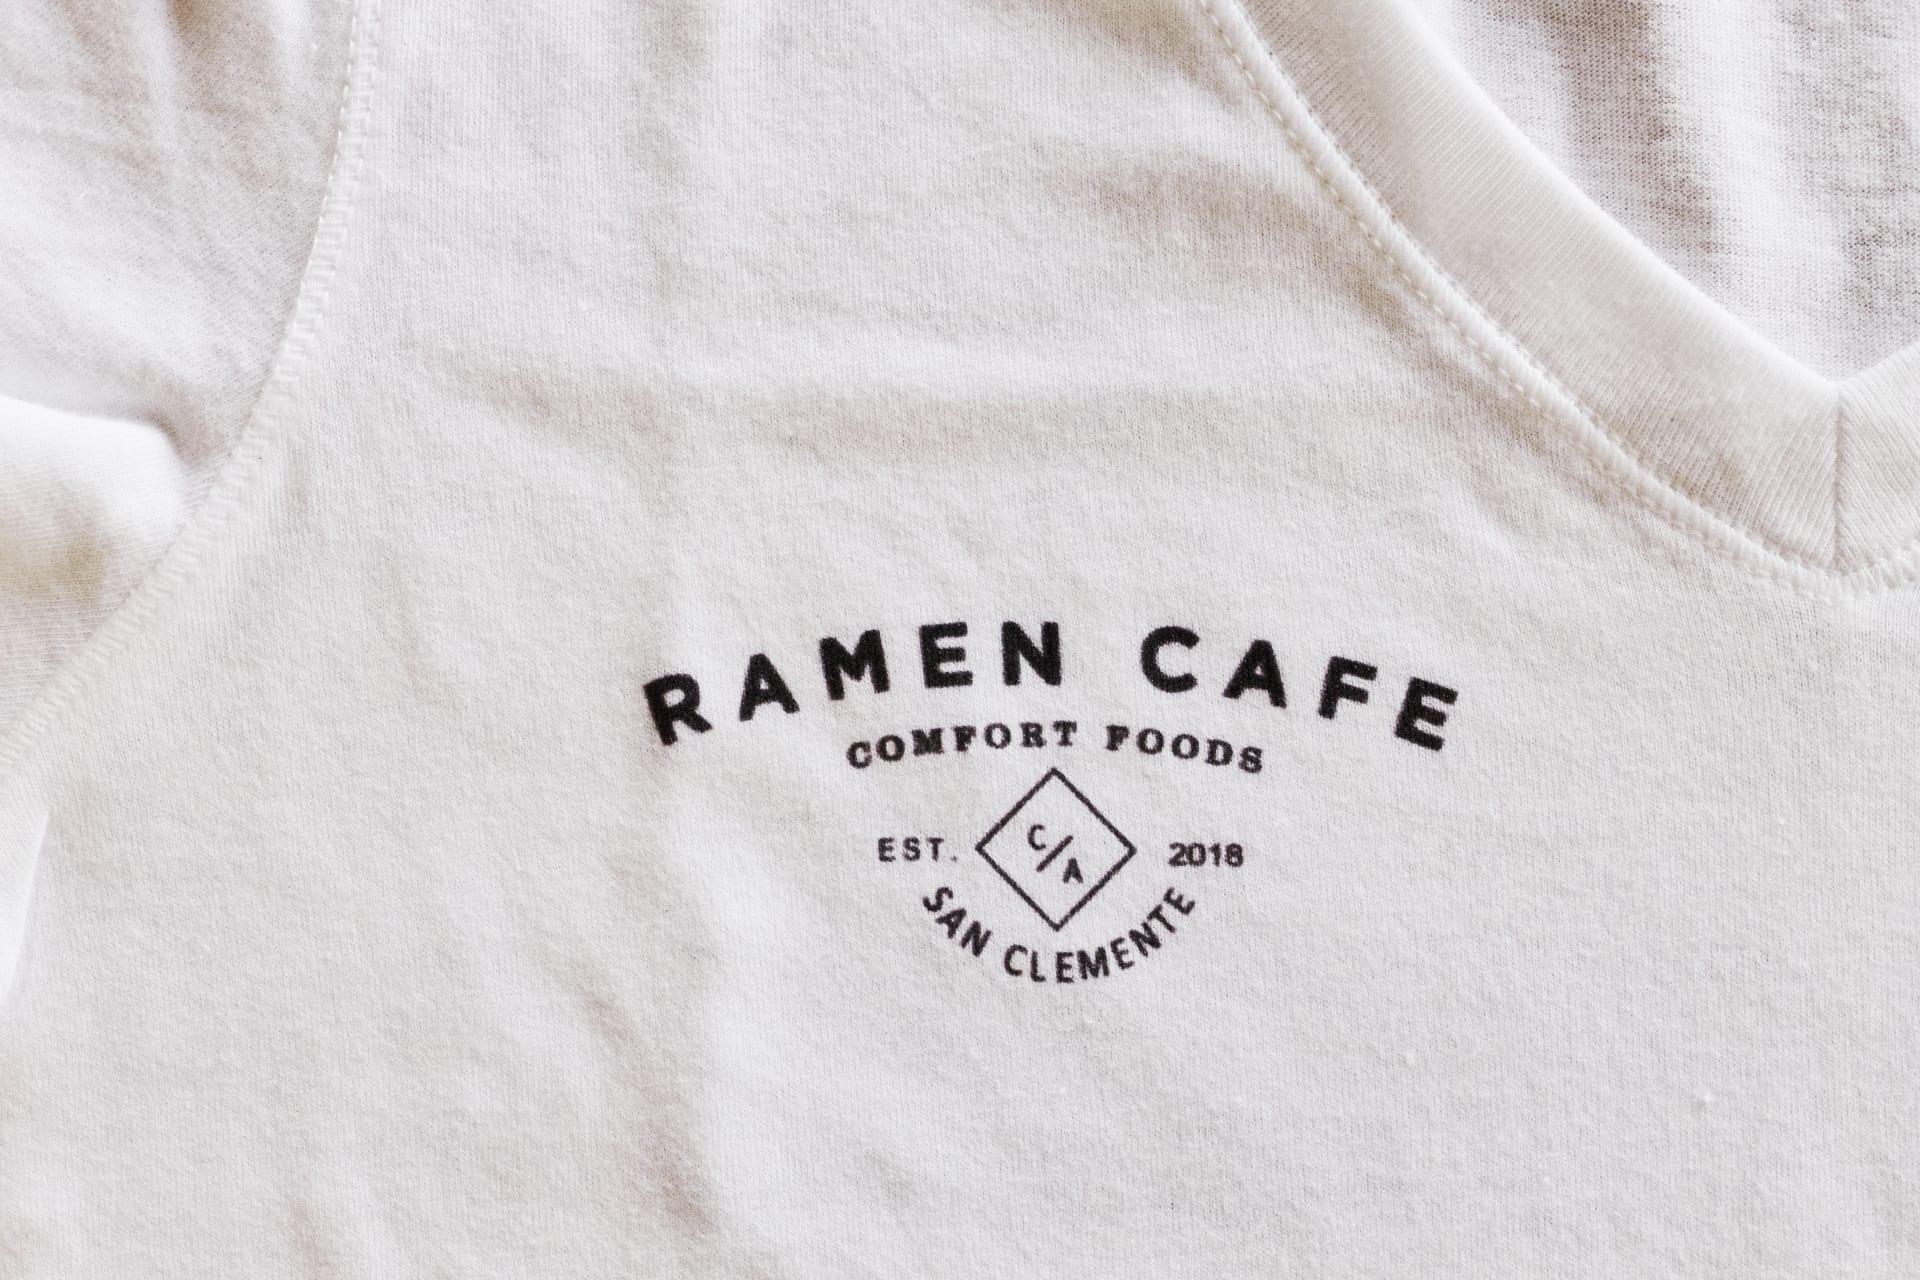 The Ramen Cafe Gallery